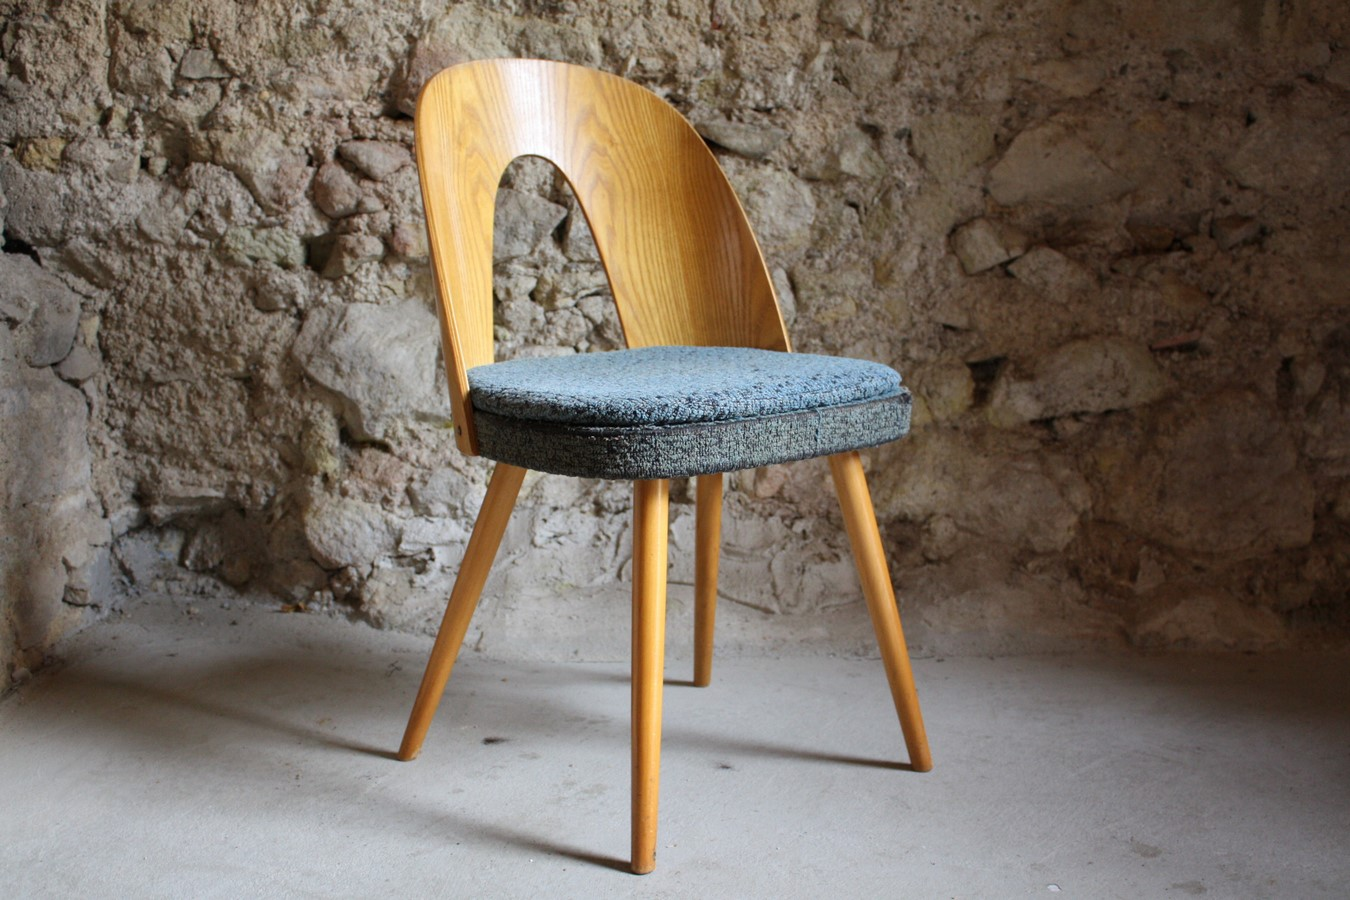 cafehausstuhl antonin suman 1 v 1 design ikonen. Black Bedroom Furniture Sets. Home Design Ideas